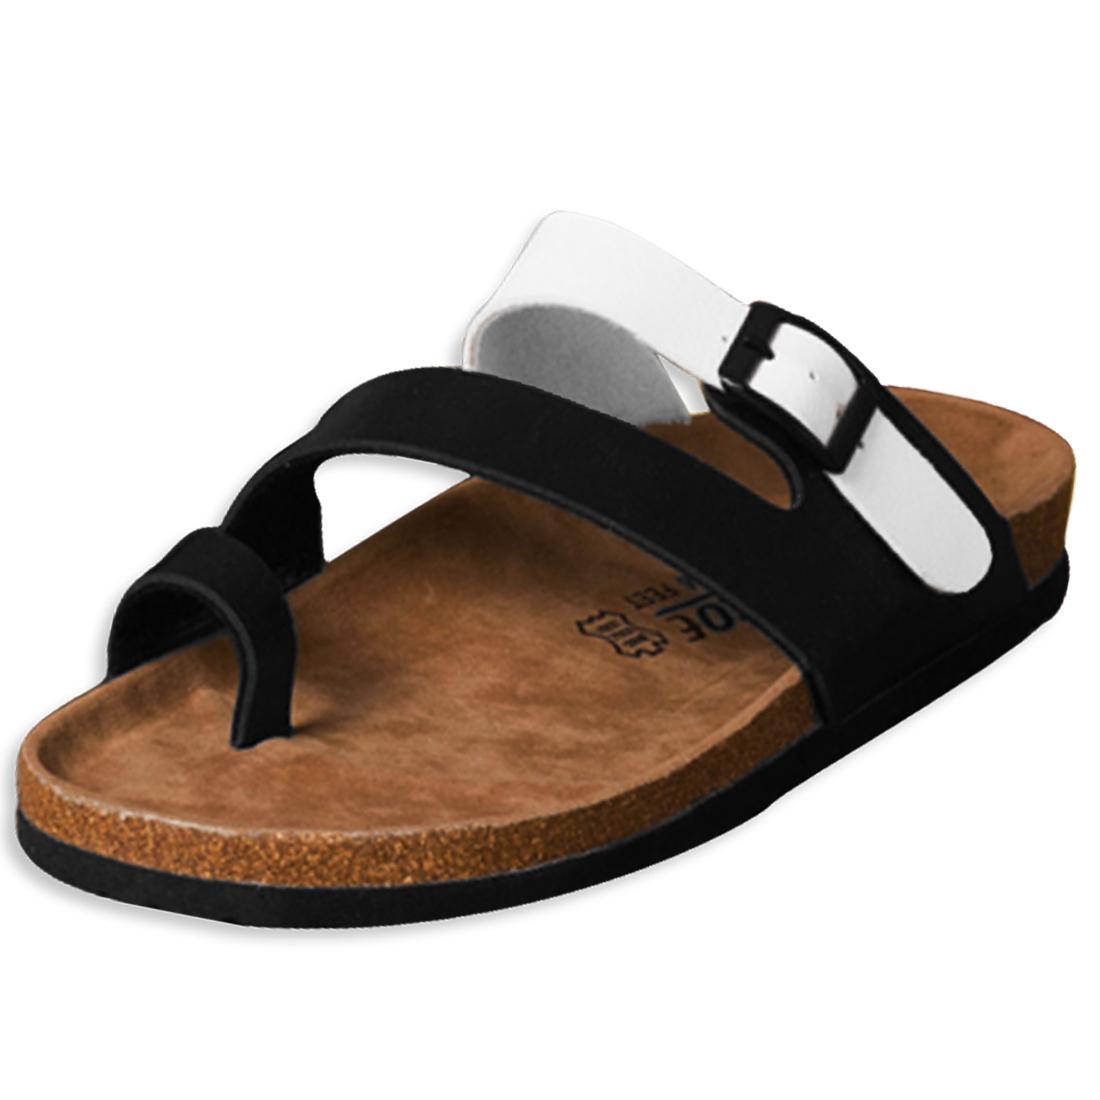 Unisex Single Buckle Black White Slide Sandals US 6